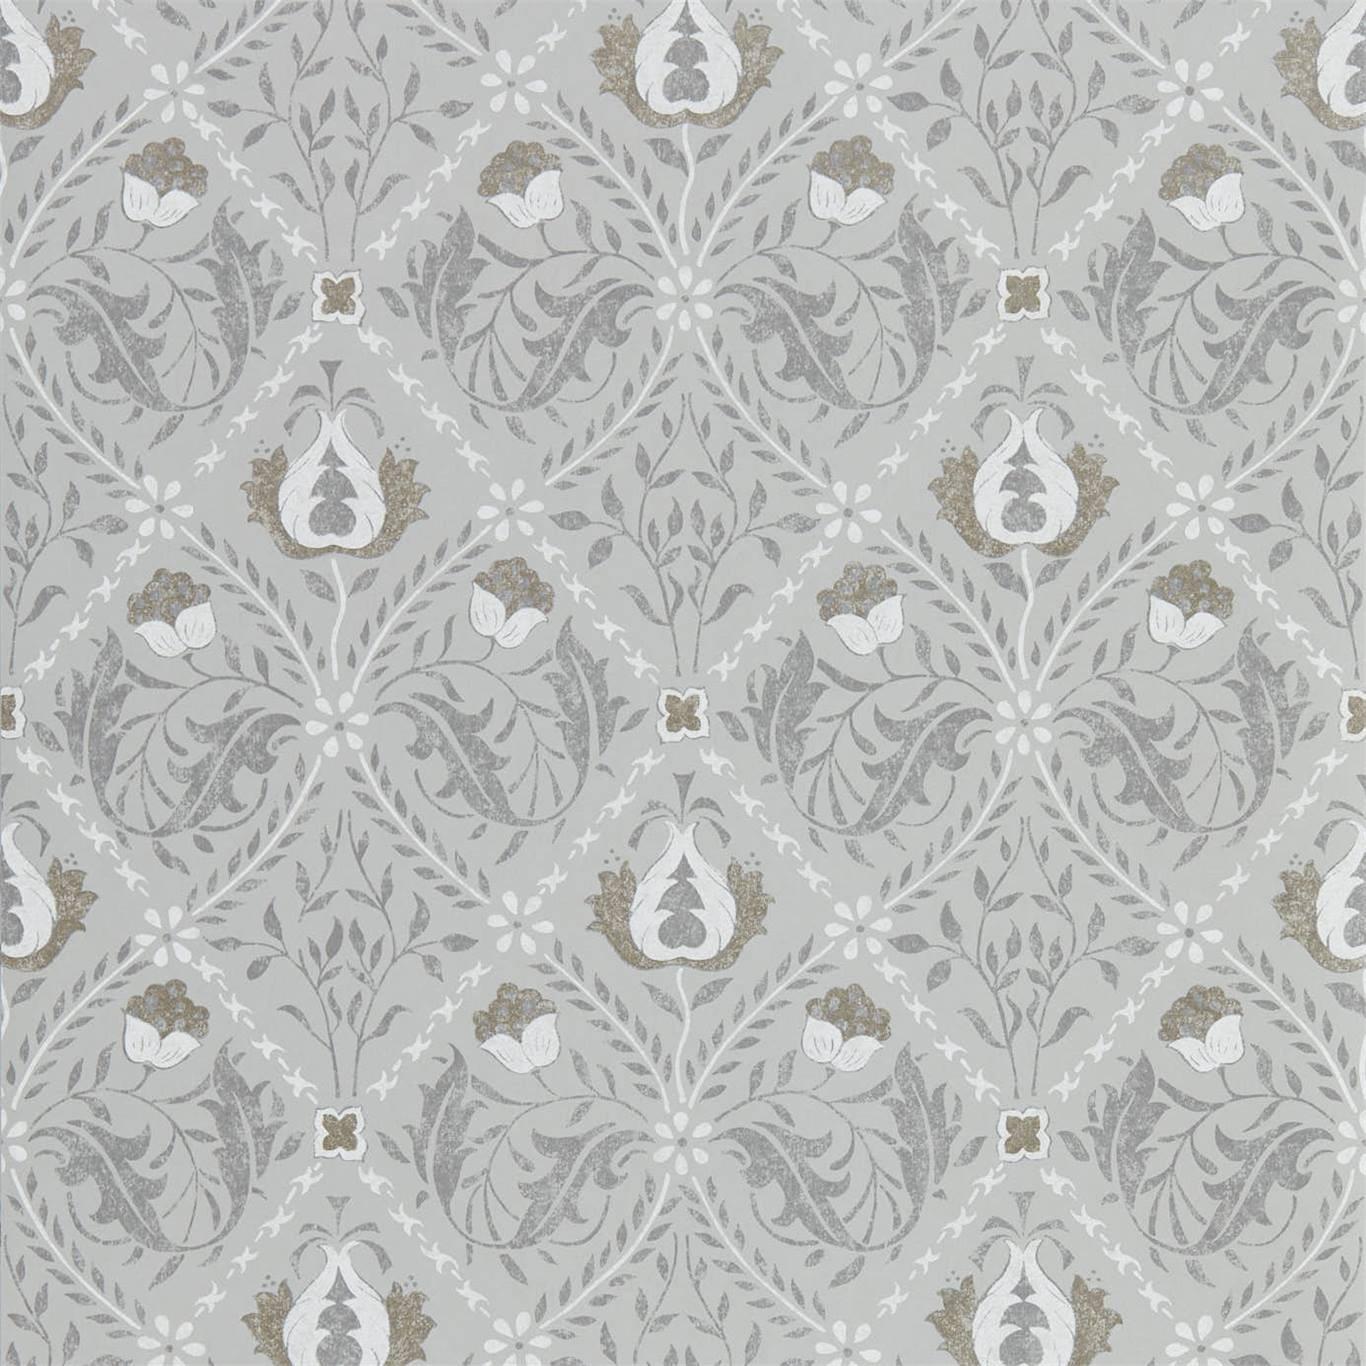 Morris & Co Tapet Pure Trellis Lightish Grey